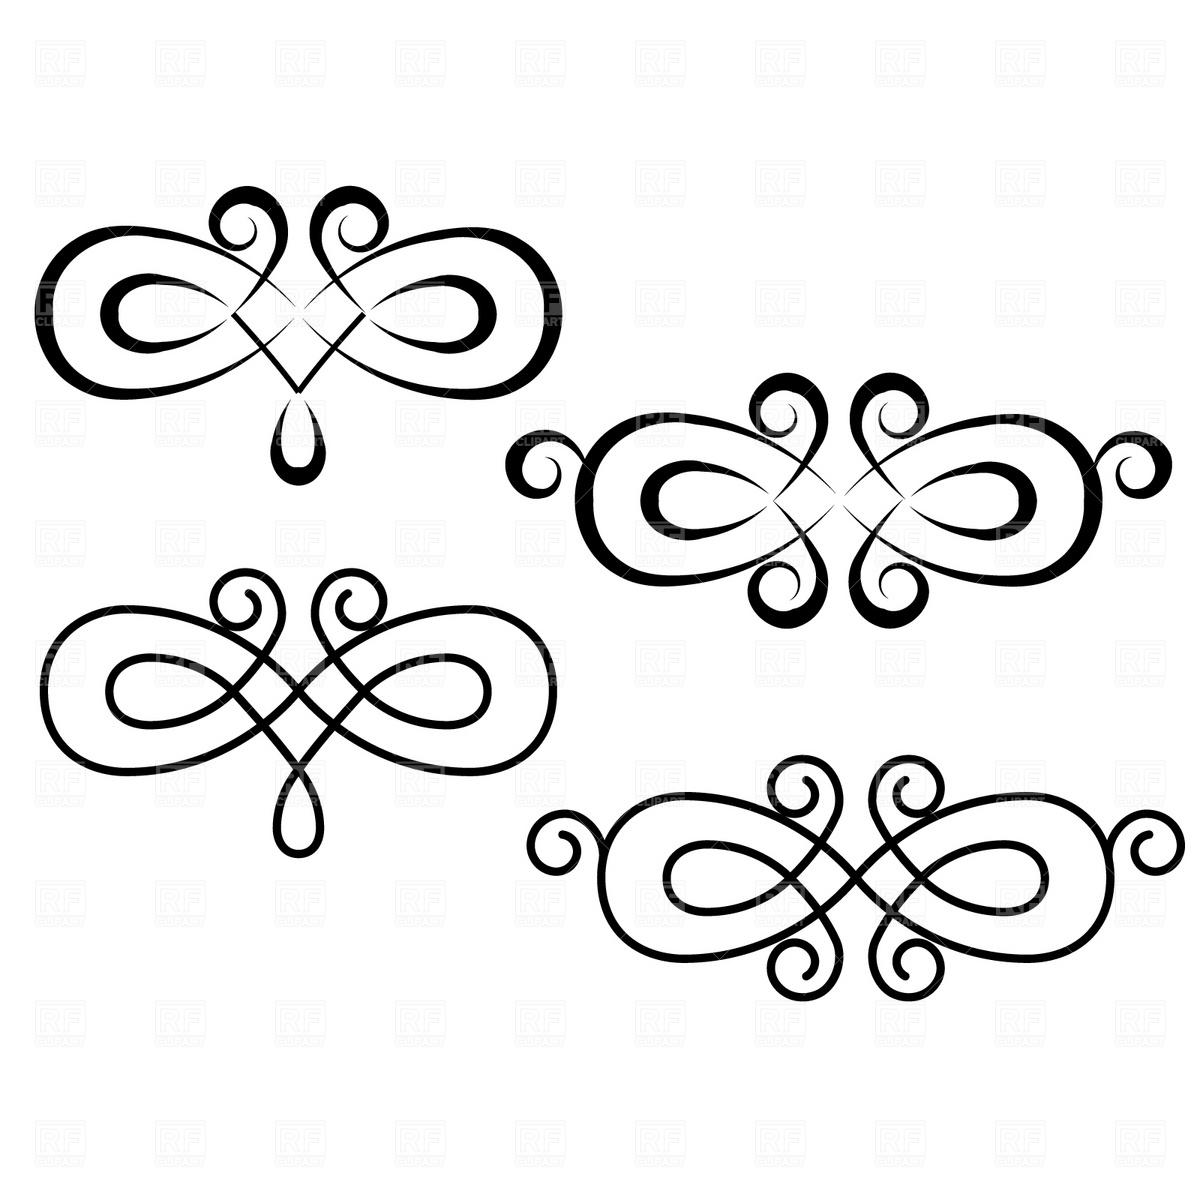 Clip Art Design : Free vector elegant swirls images swirl